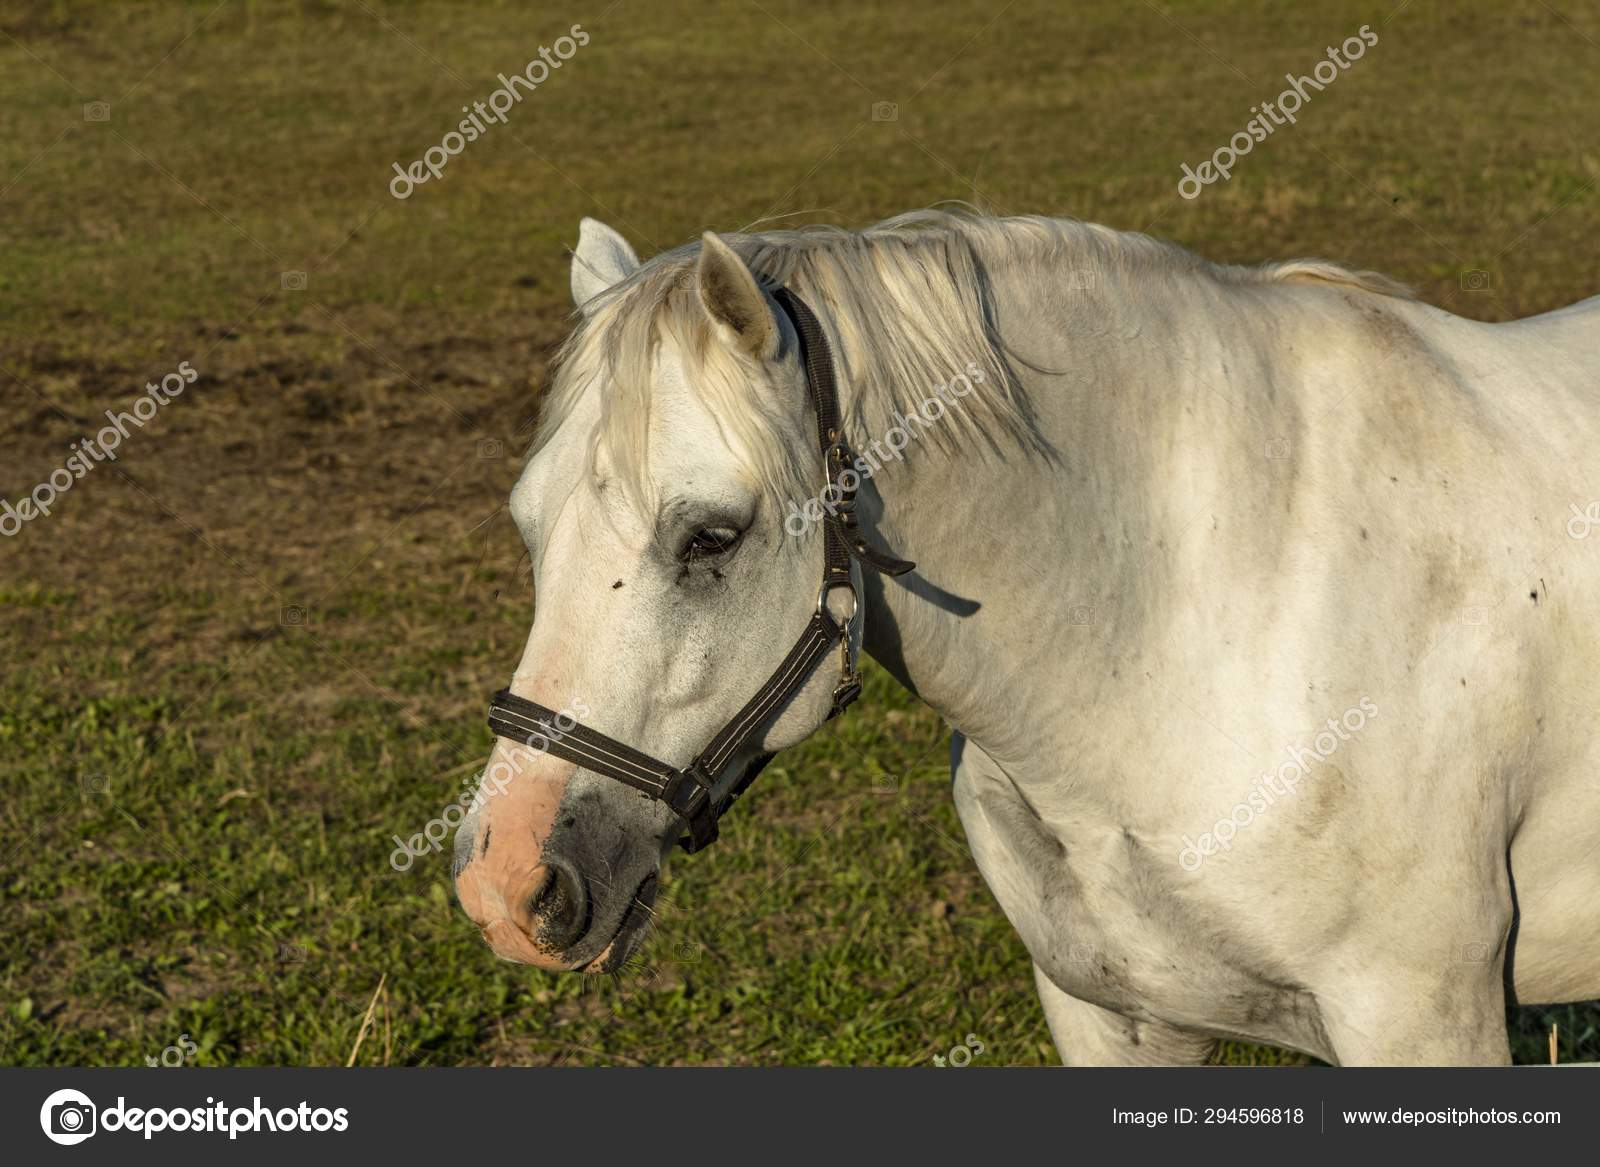 Close View Cute White Horse Green Field Background Beautiful Animals Stock Photo C Mulevich 294596818